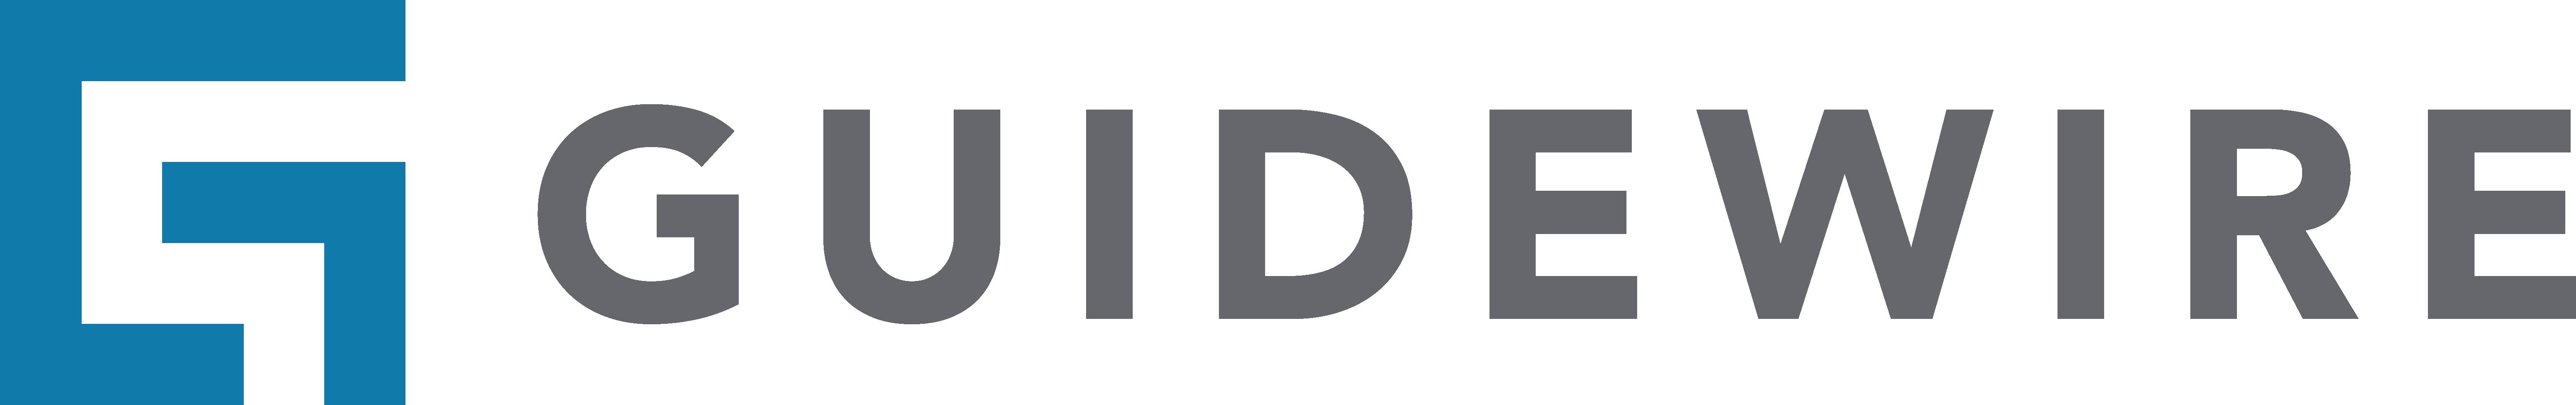 guidewire_logo_CMYK